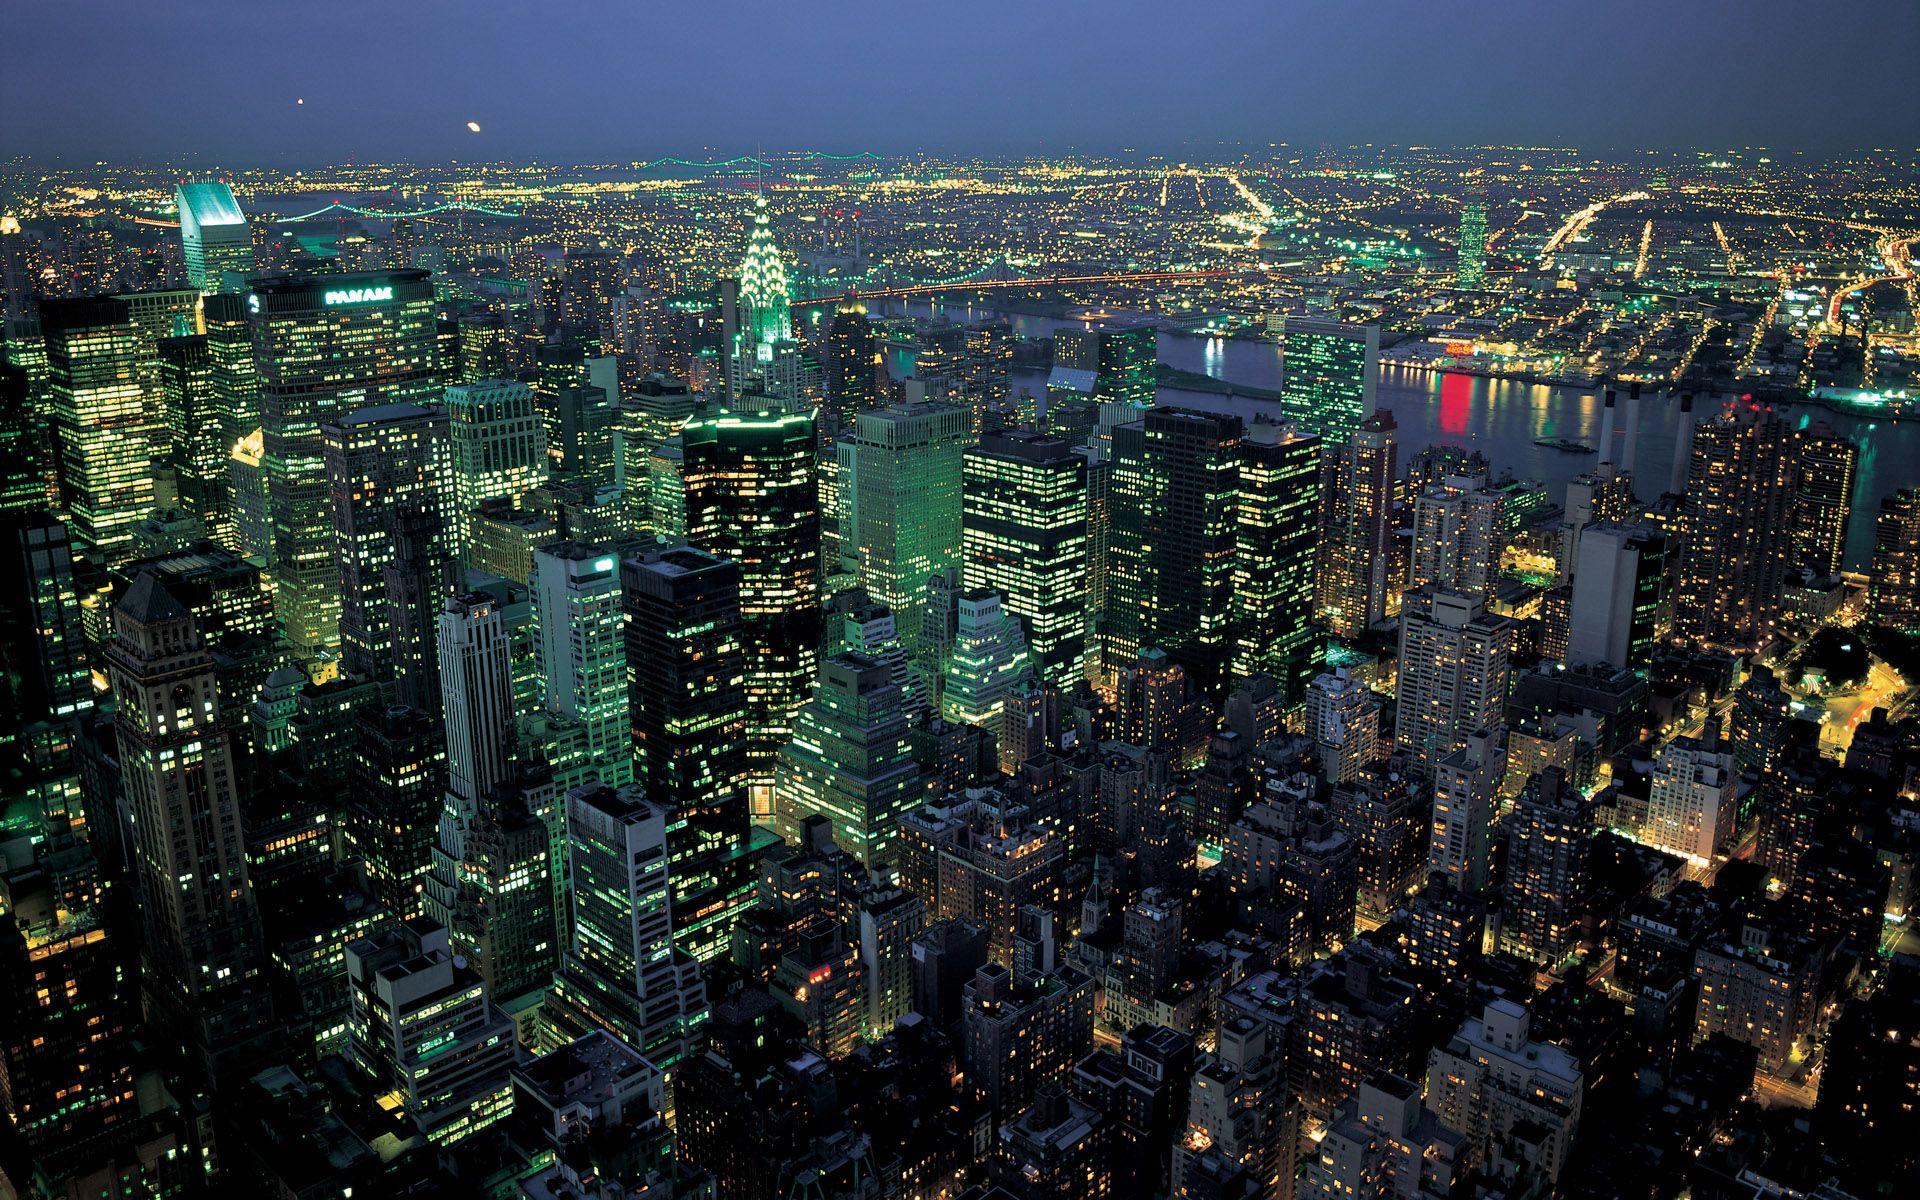 80's New York (Hint Pan Am Building) New york night